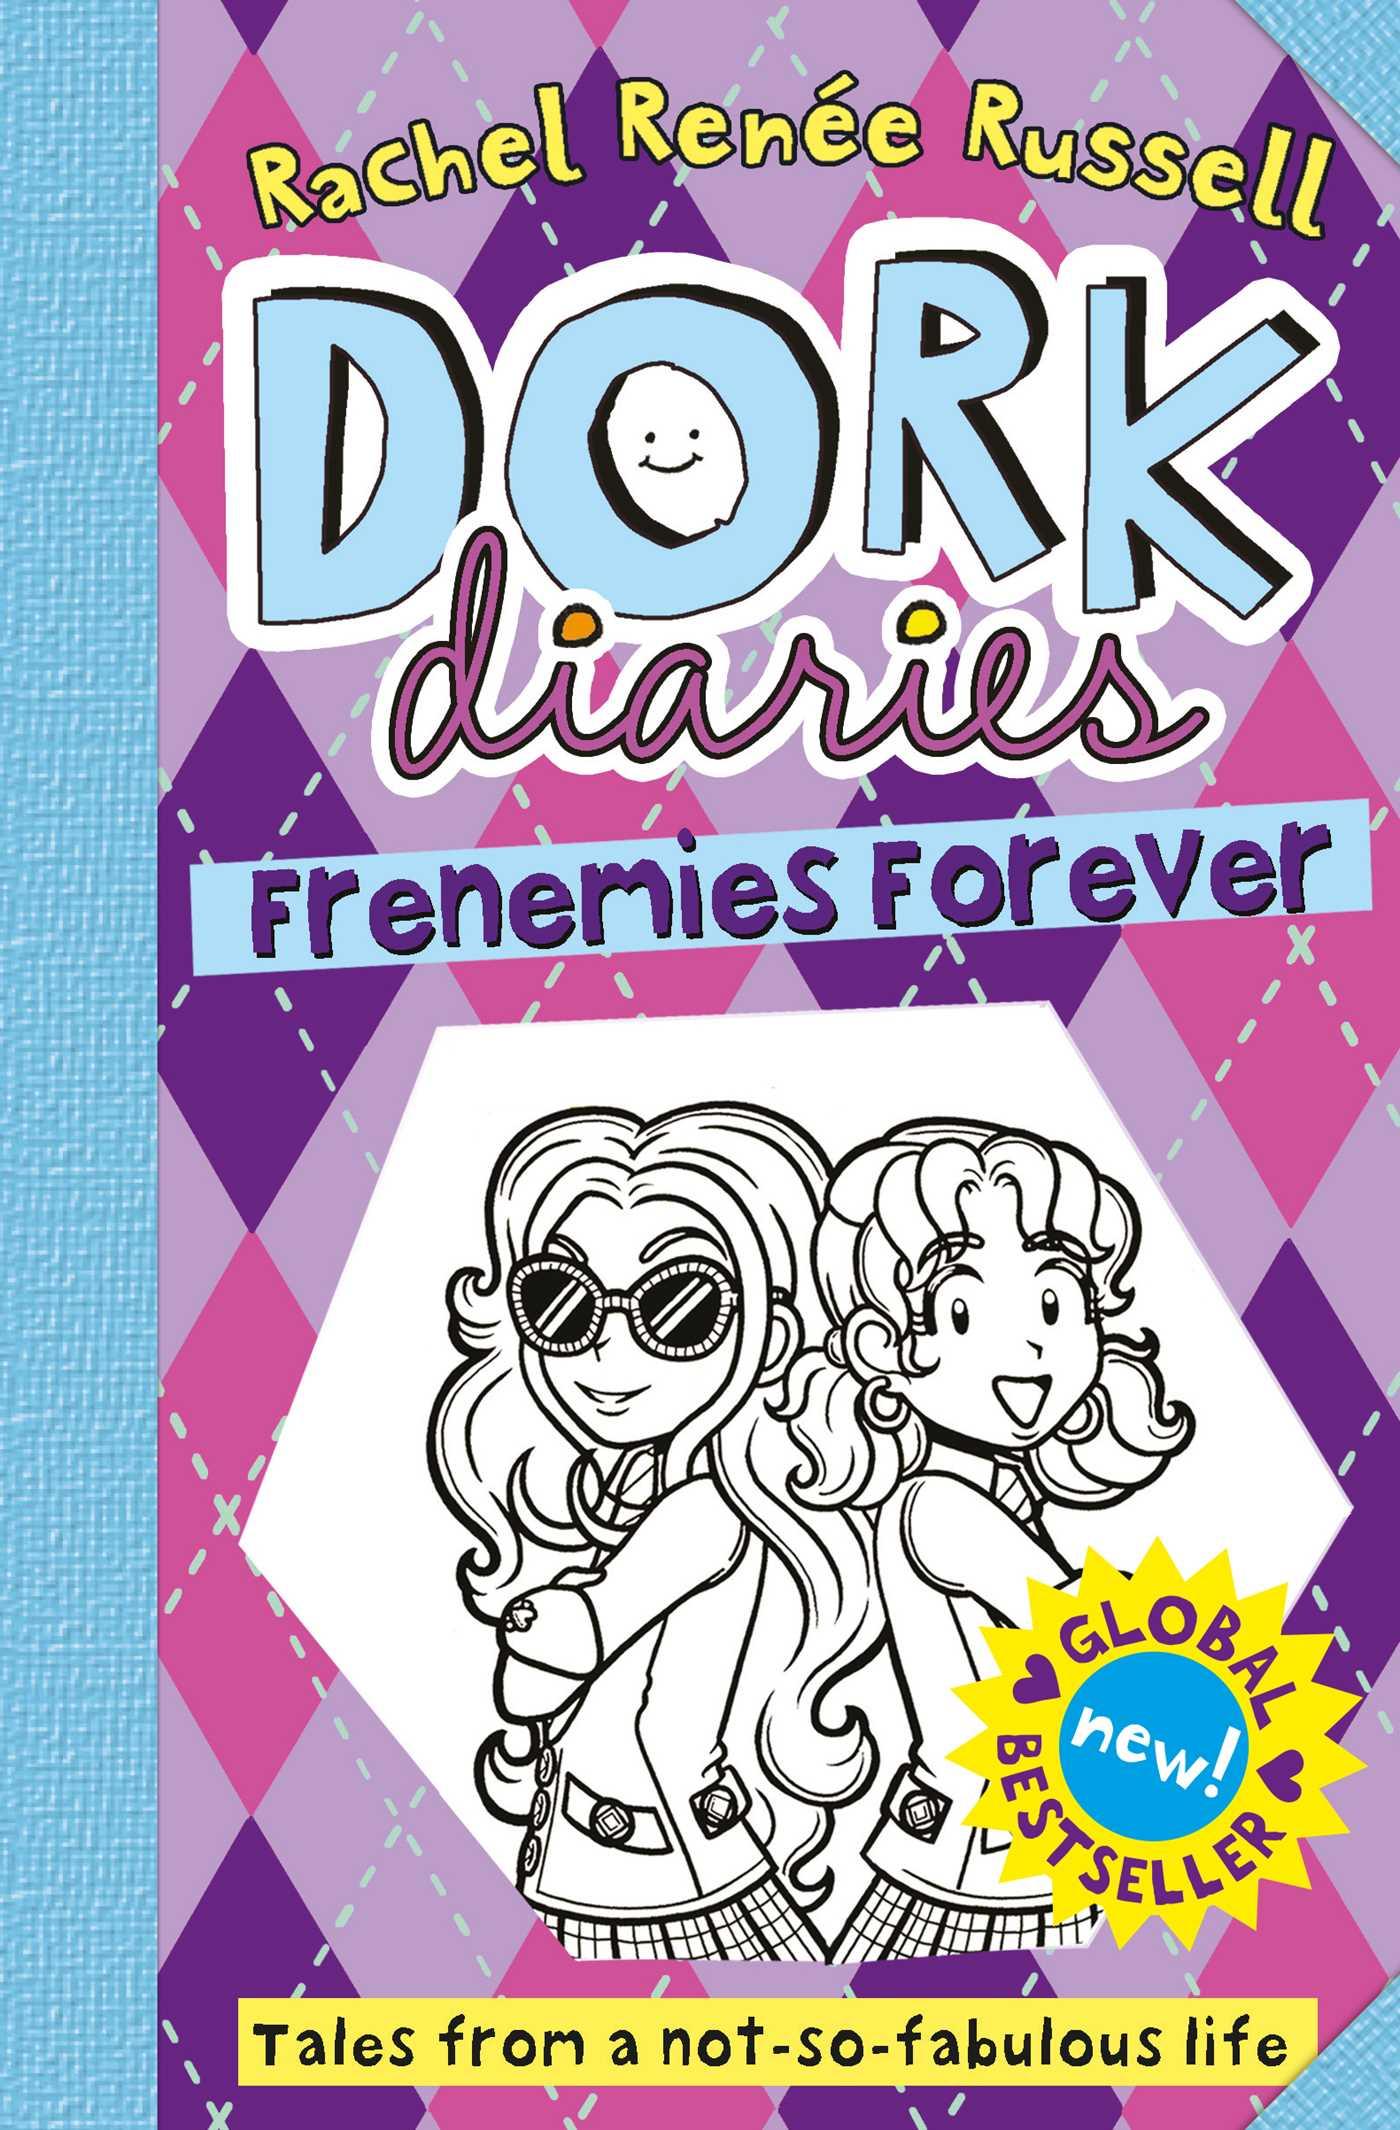 Dork diaries frenemies forever 9781471158018 hr